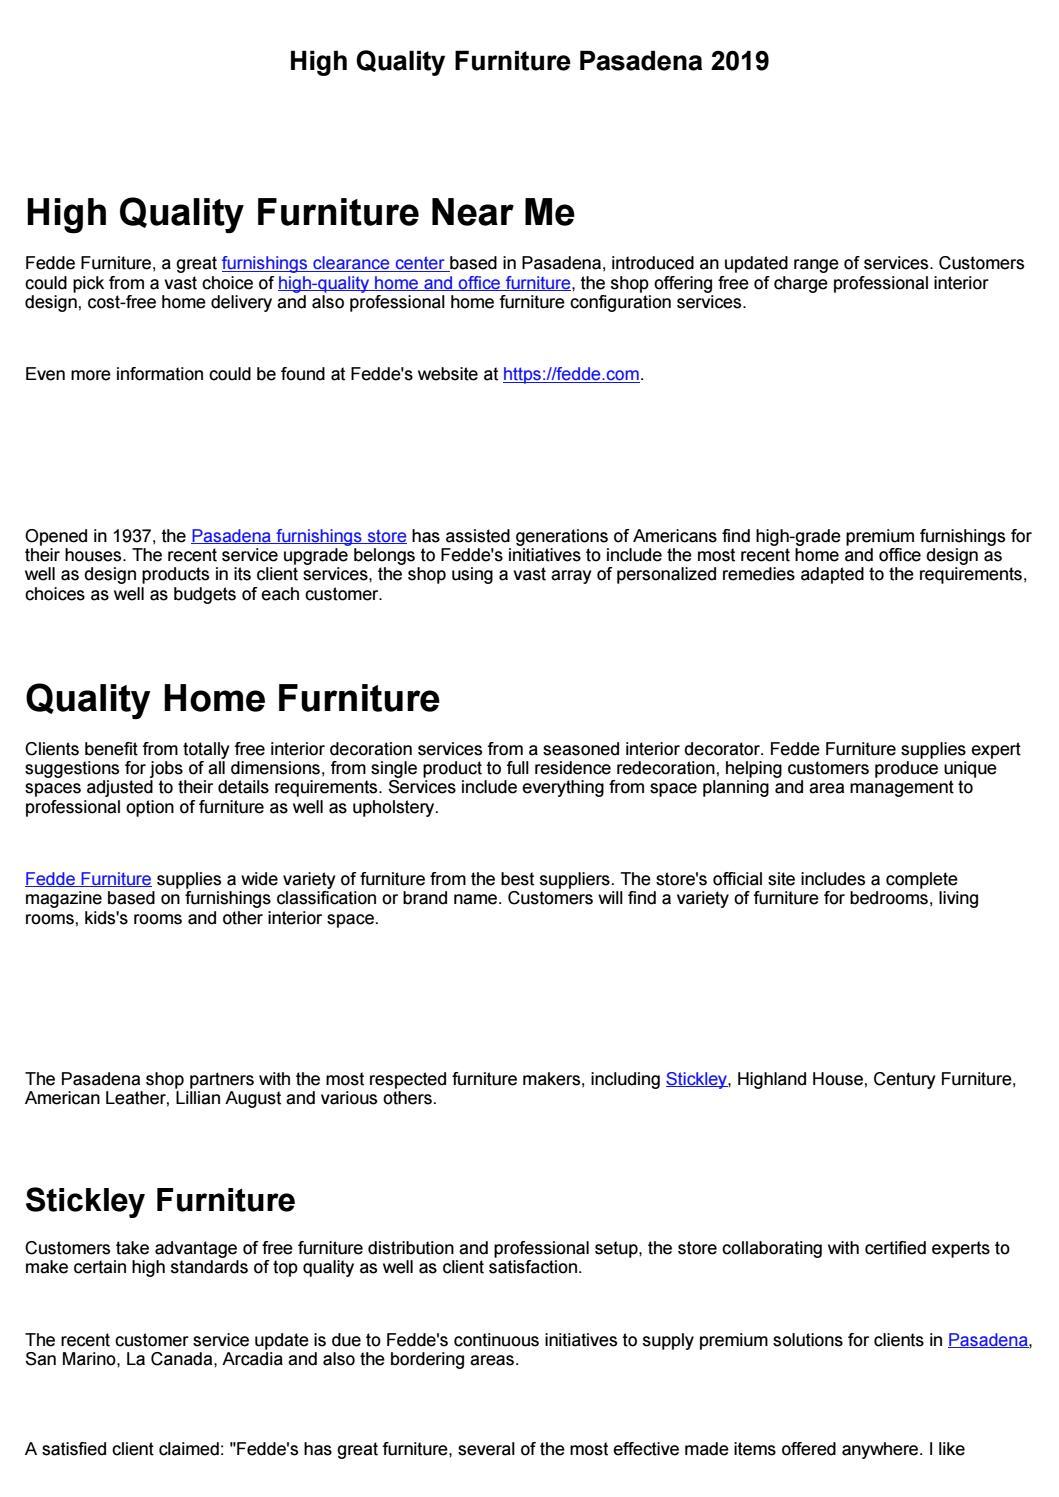 Top Furniture Pasadena 2019 By Austinquinceanera Issuu